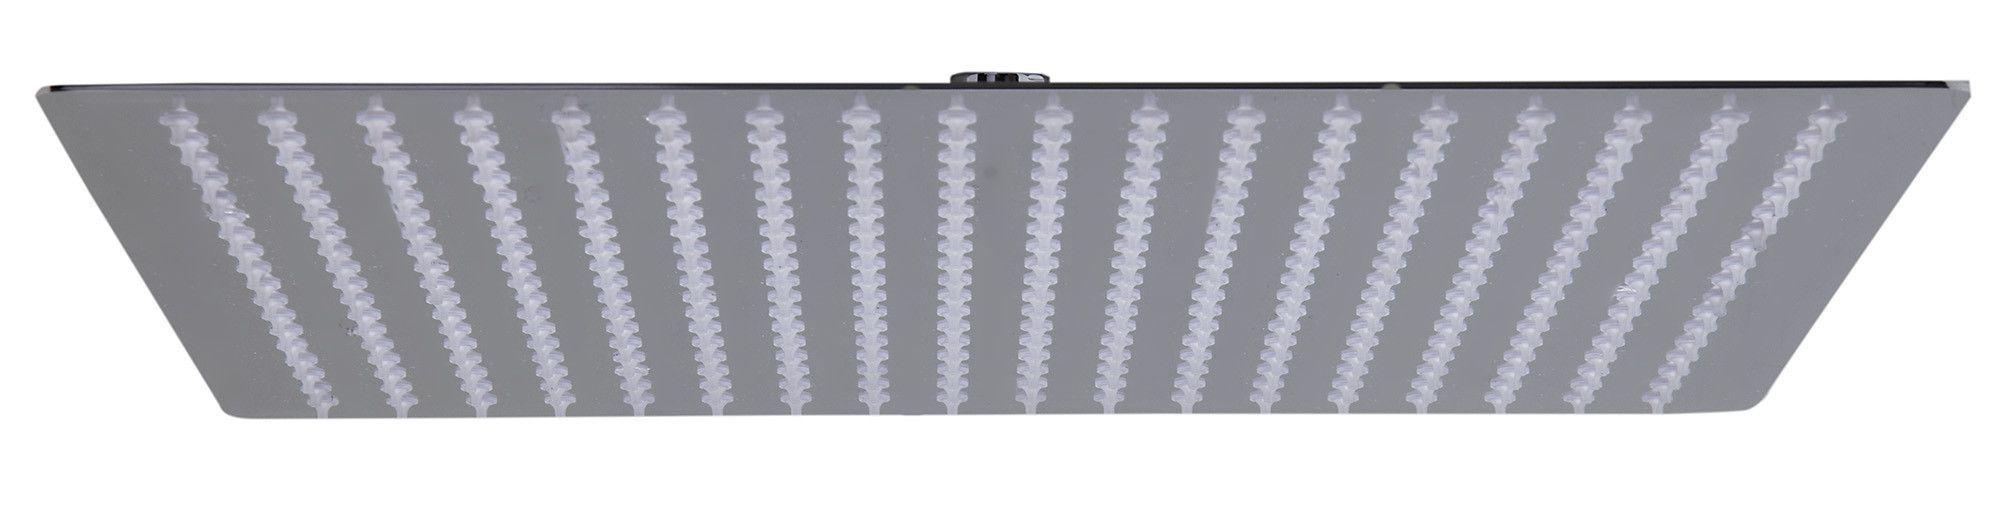 "ALFI brand RAIN16S-PSS Solid Polished Stainless Steel 16"" Square Ultra Thin Rain Shower Head"